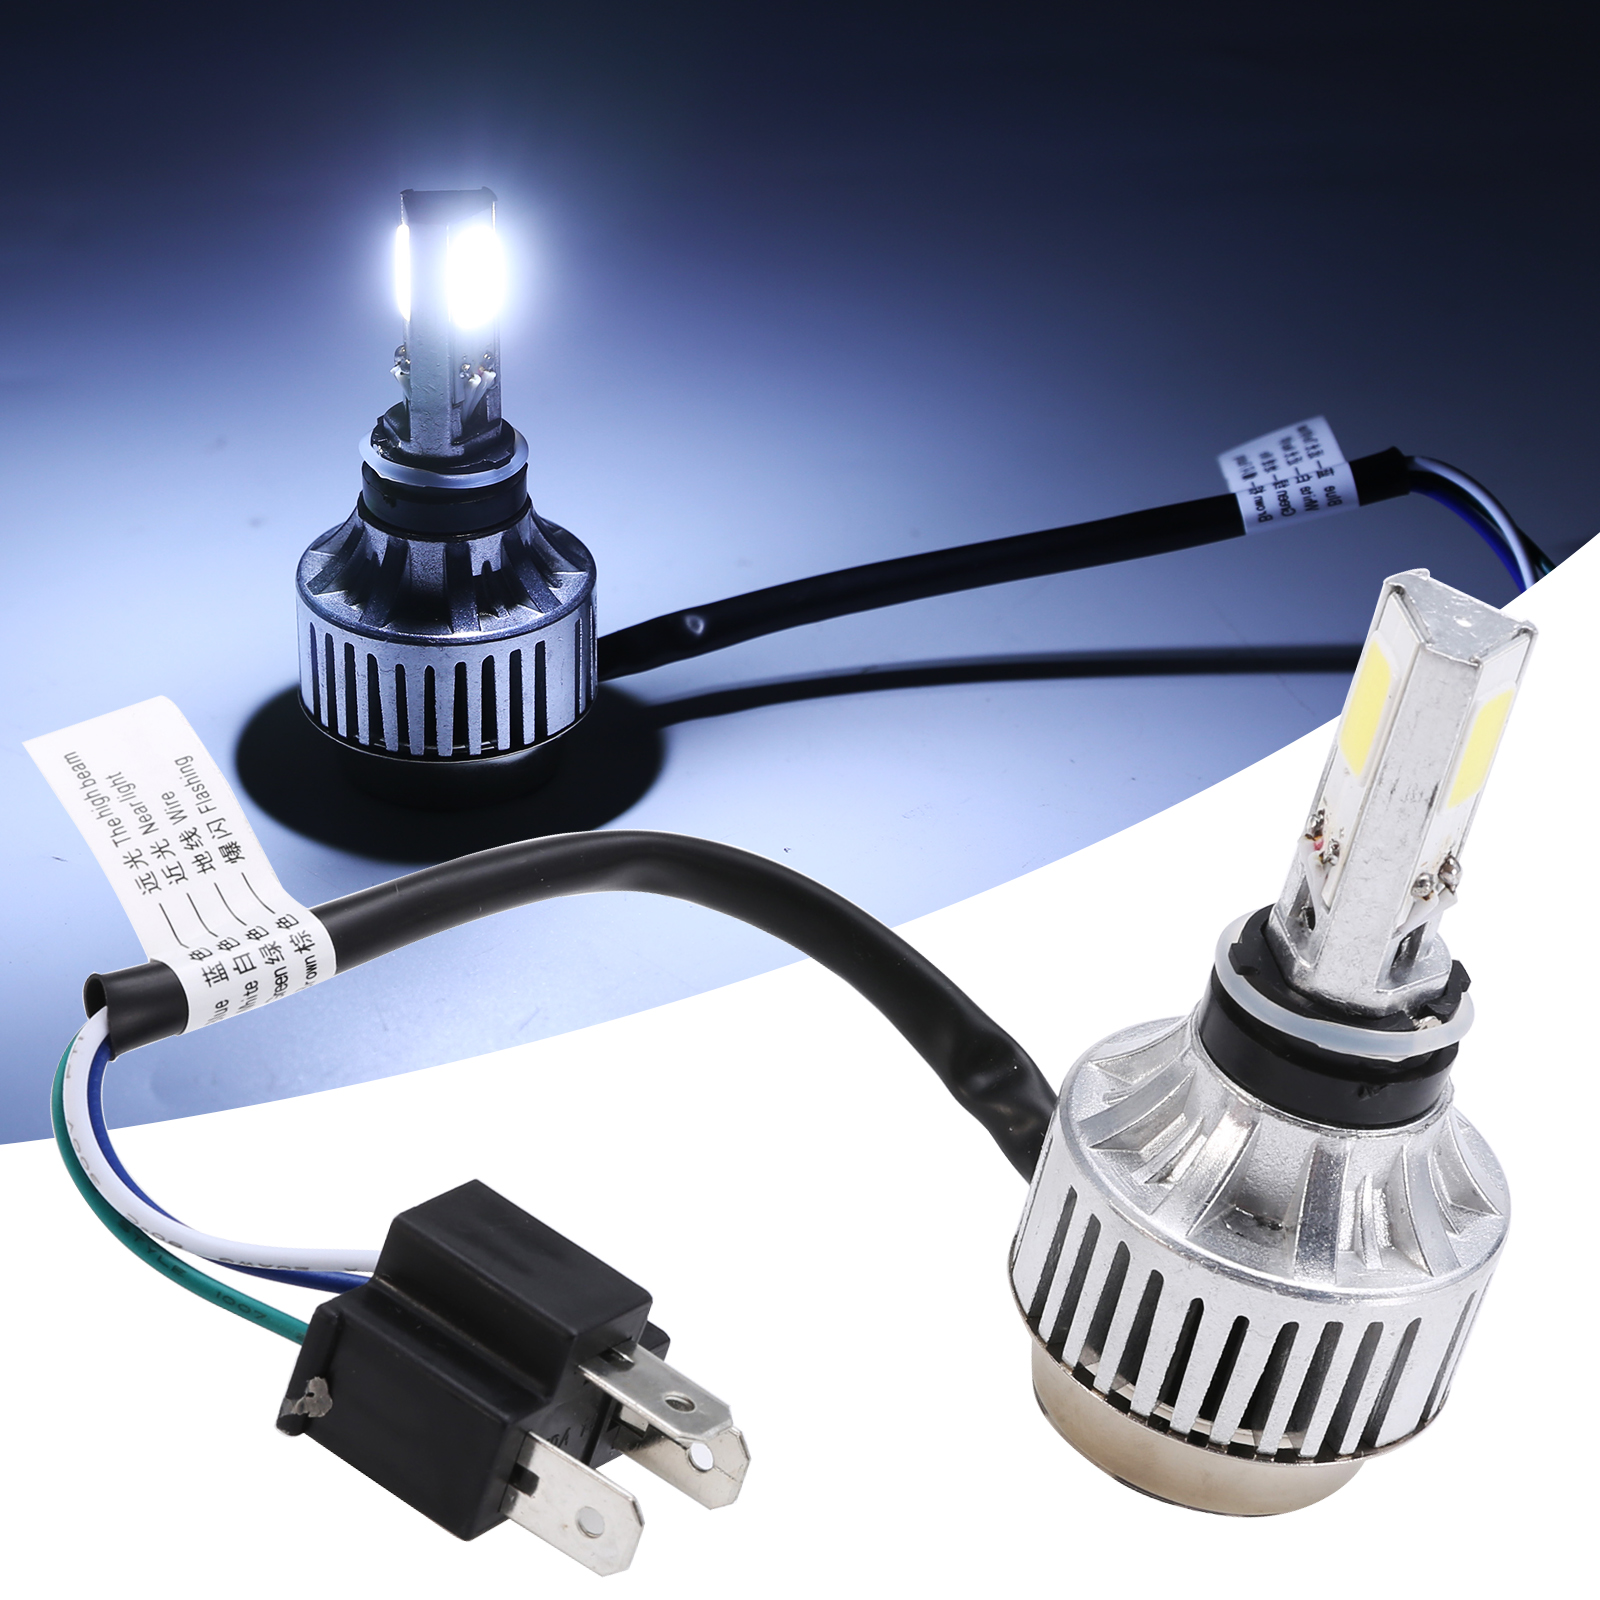 1 Set H4 BA20D LED Hi/Lo Beam Motorcycle Headlight Front Light Lamp Bulb 6500K Motor White Headlamp Aluminum Alloy Housing